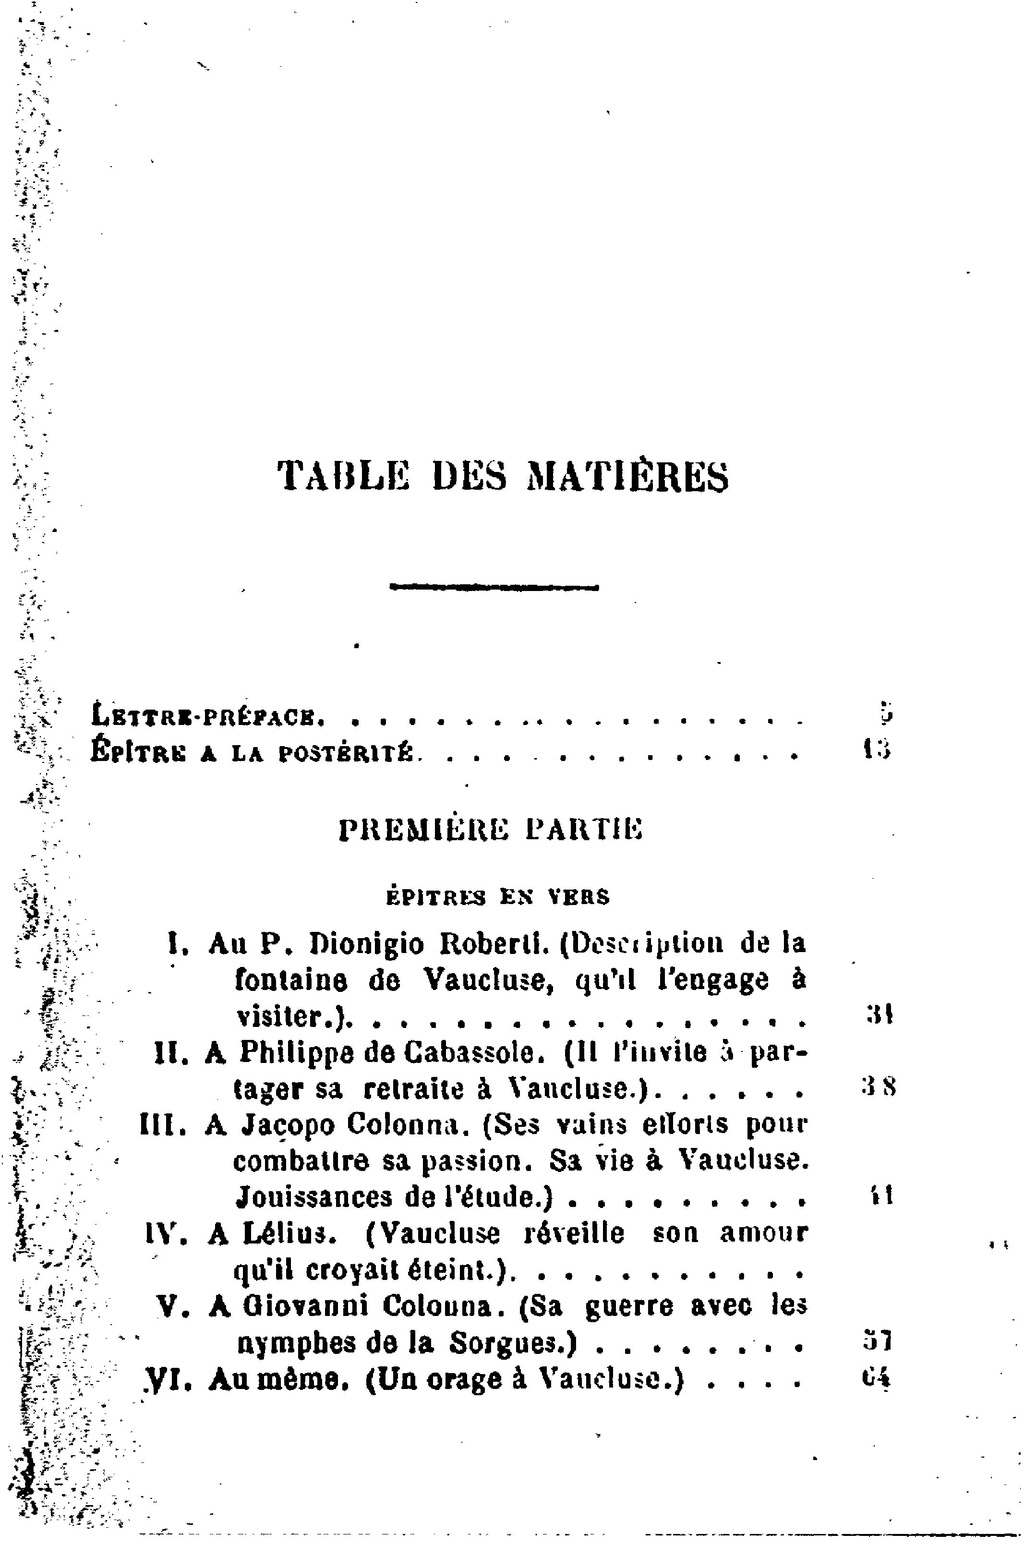 vaucluse 3 lettres